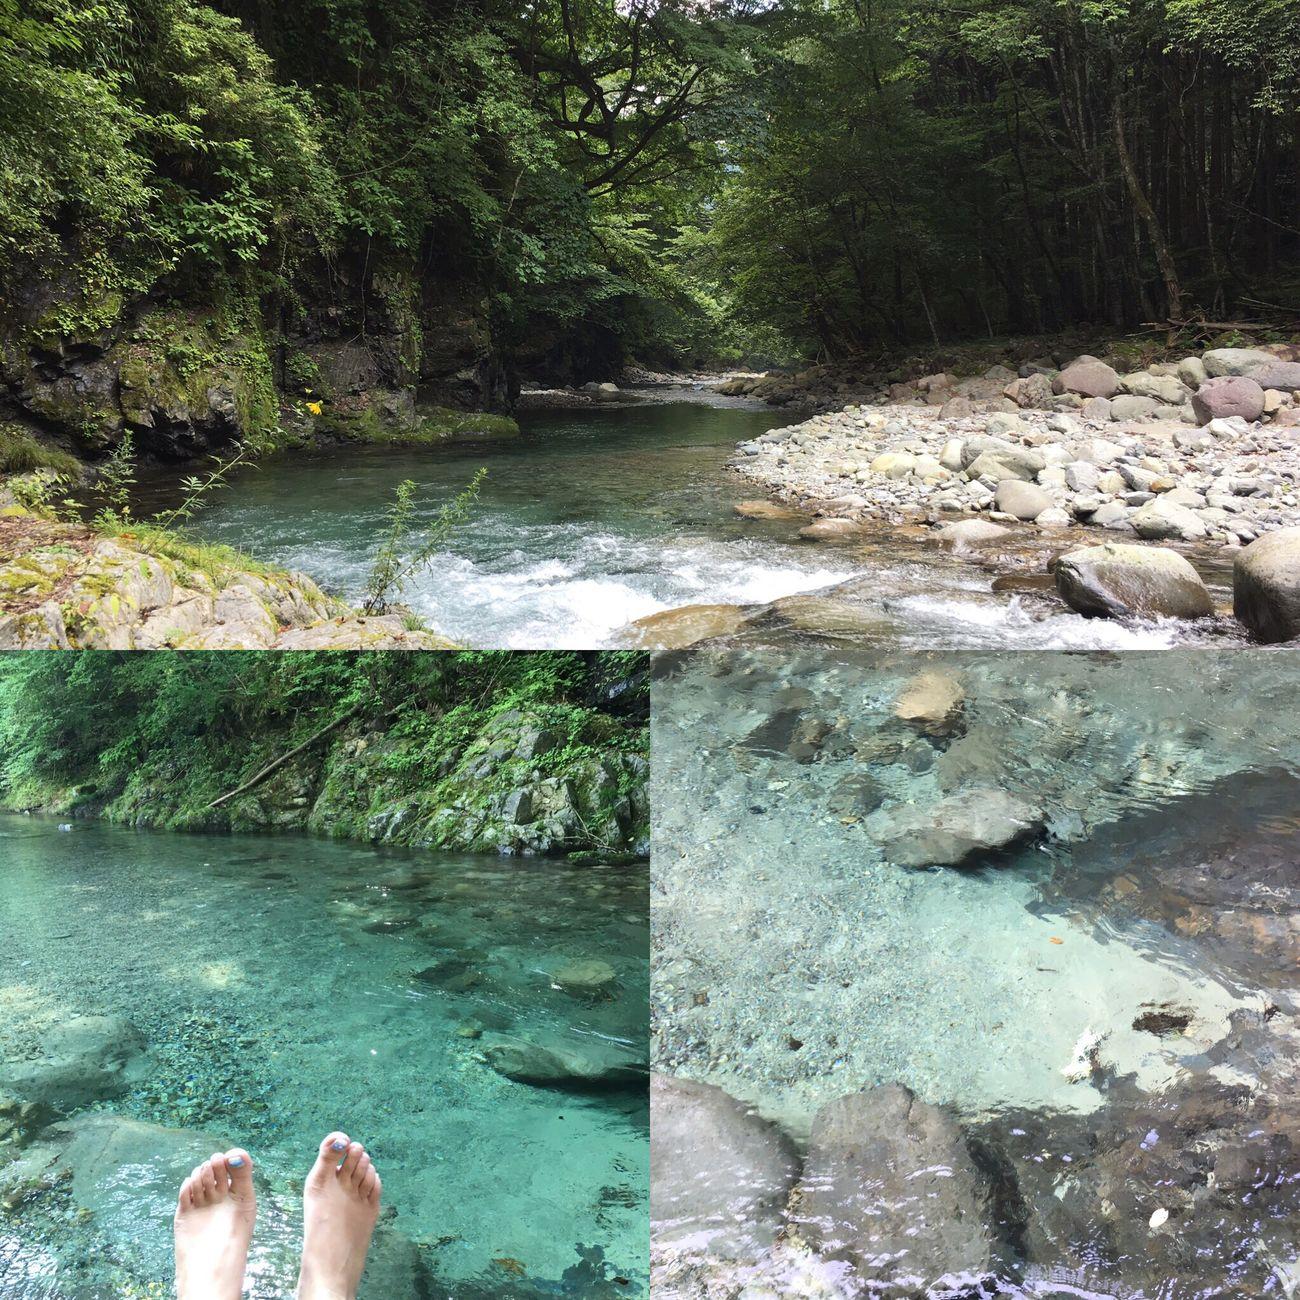 Enjoying Life Hi! 森 大自然 川 Enjoy Swim 癒し River Fishing Landscape Japan 風景 Forest Happy 絶景 Superb View